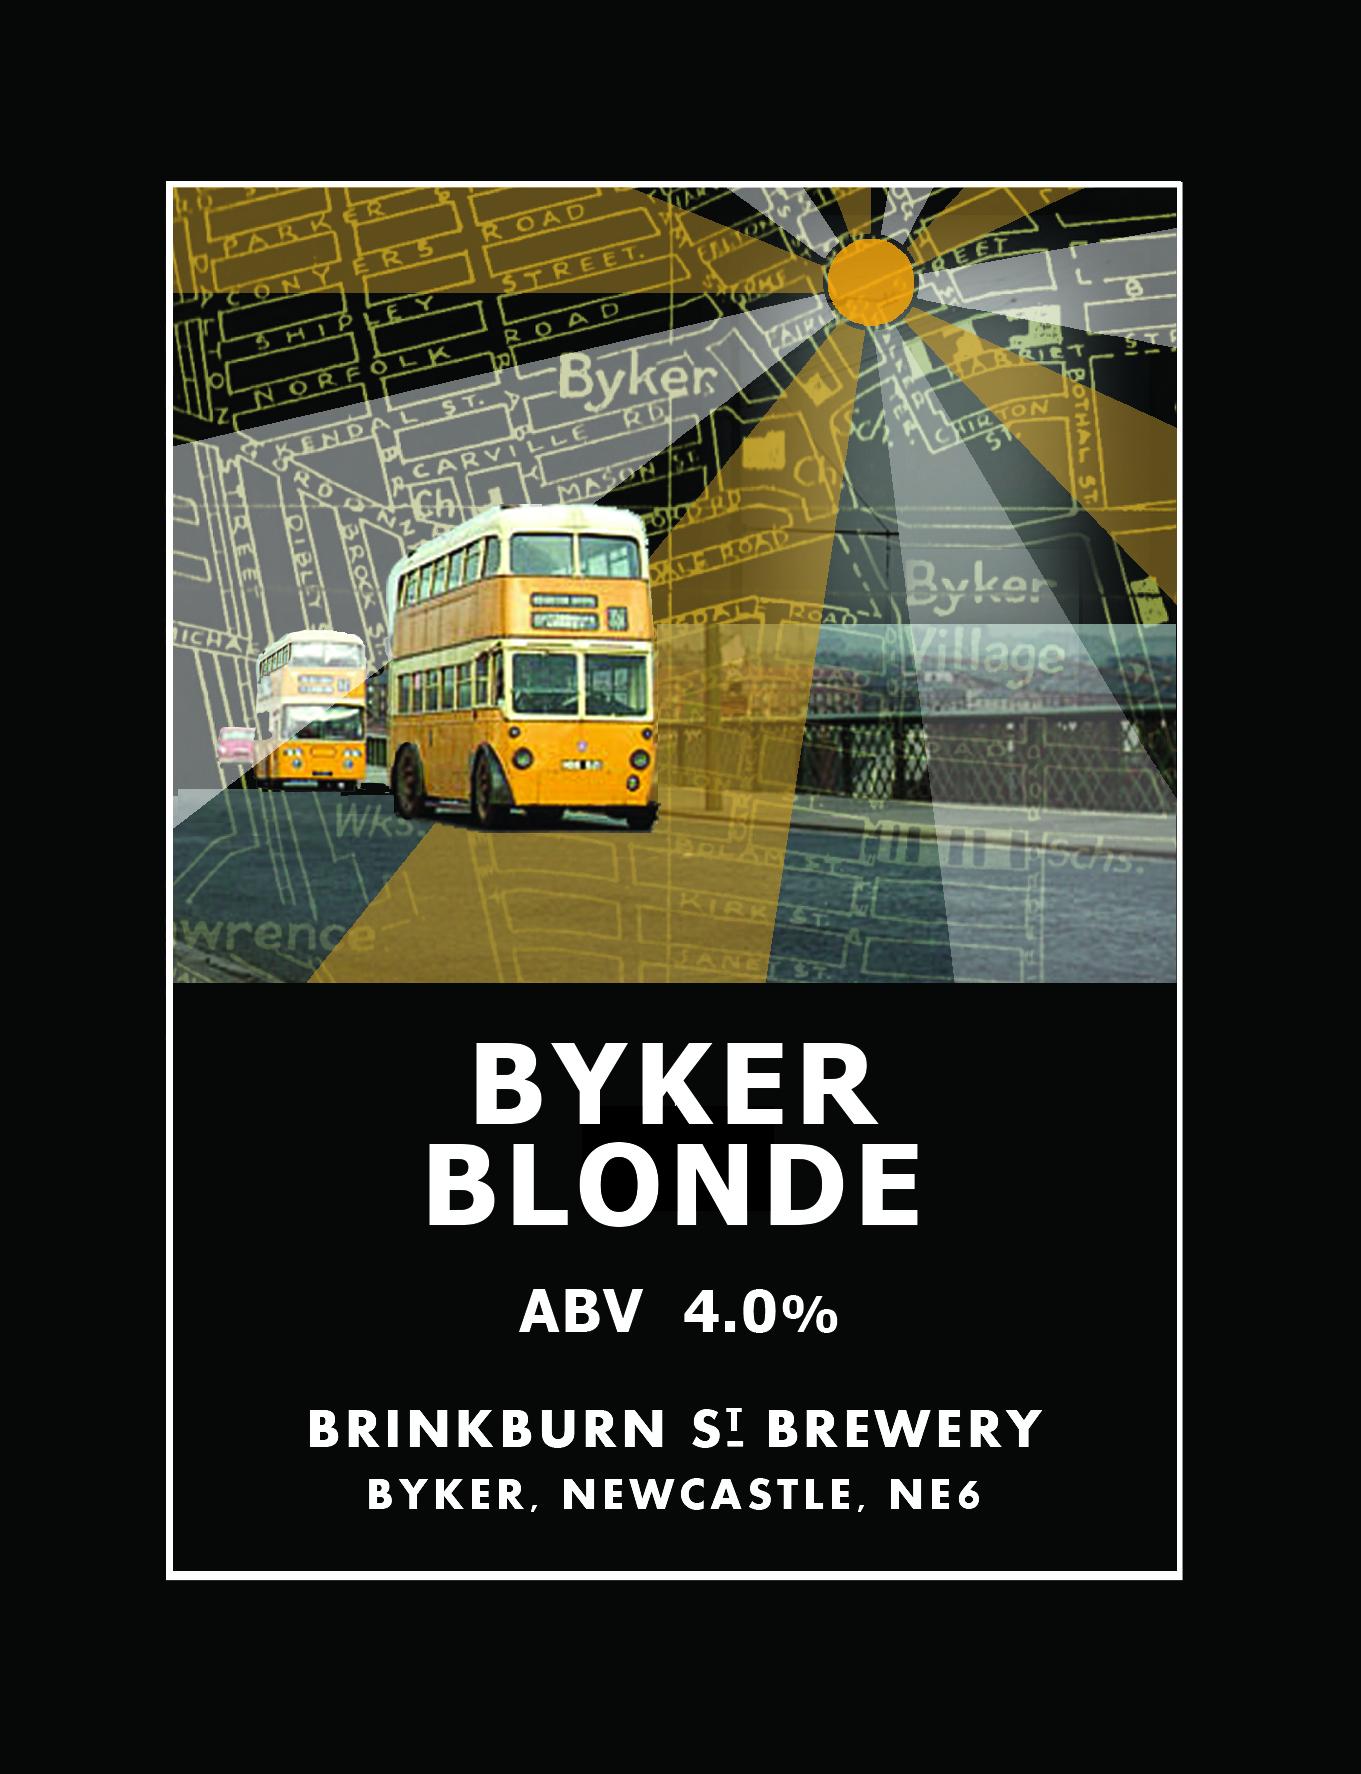 Byker Blonde pumpclip v5b 170718.jpg